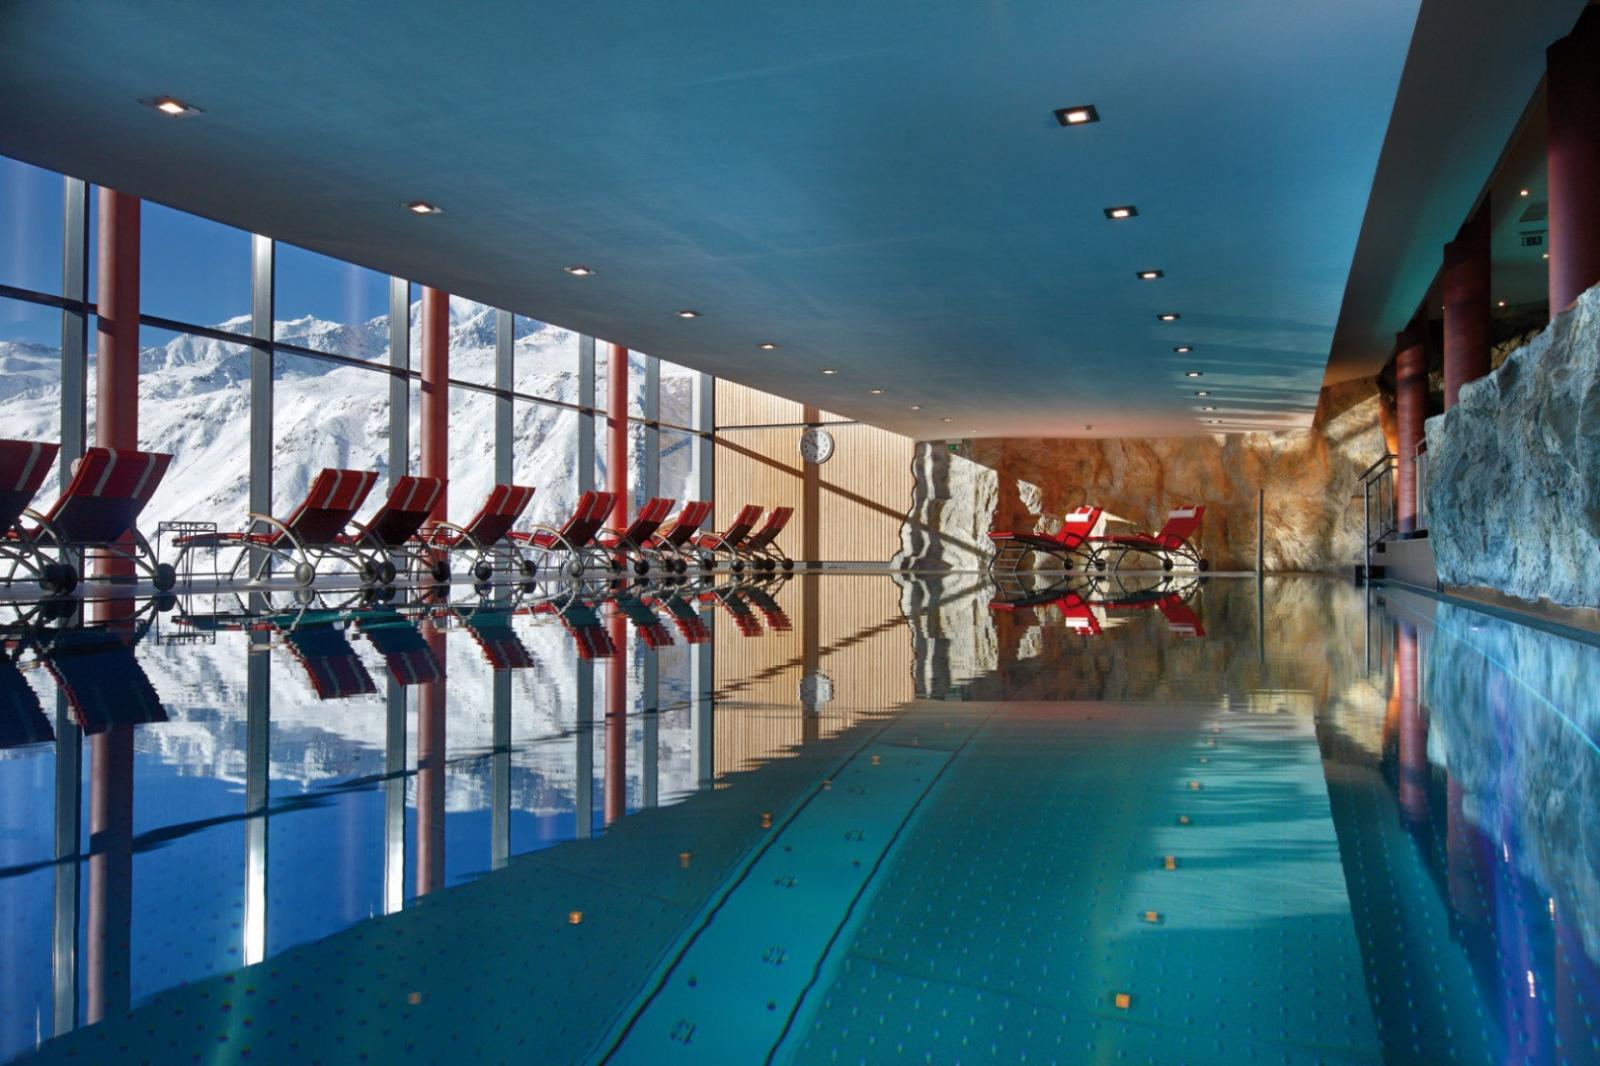 Ozontherapie: Foto vom Wellnesshotel Ski- & Golfresort Hotel Riml | Wellness Tirol